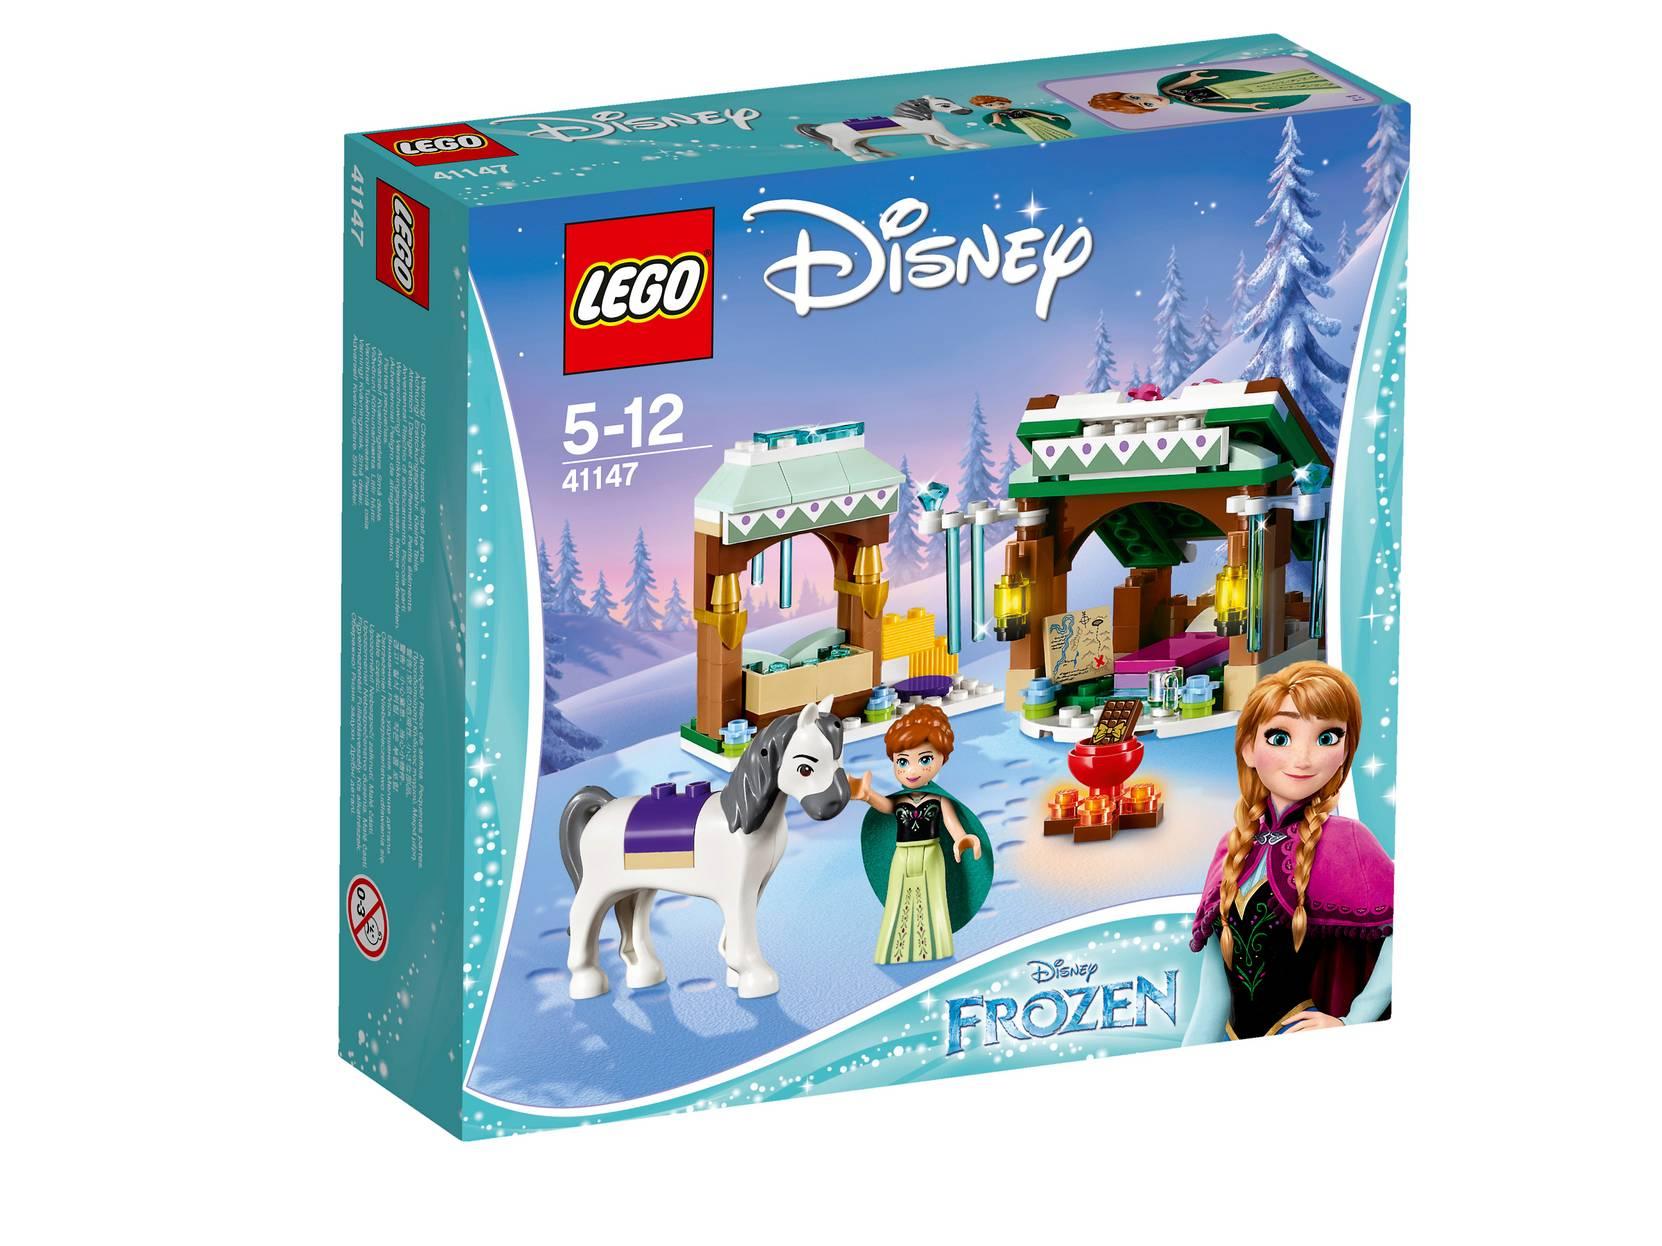 Annas Sneeventyr 41147 LEGO Lego til Børn i 41147